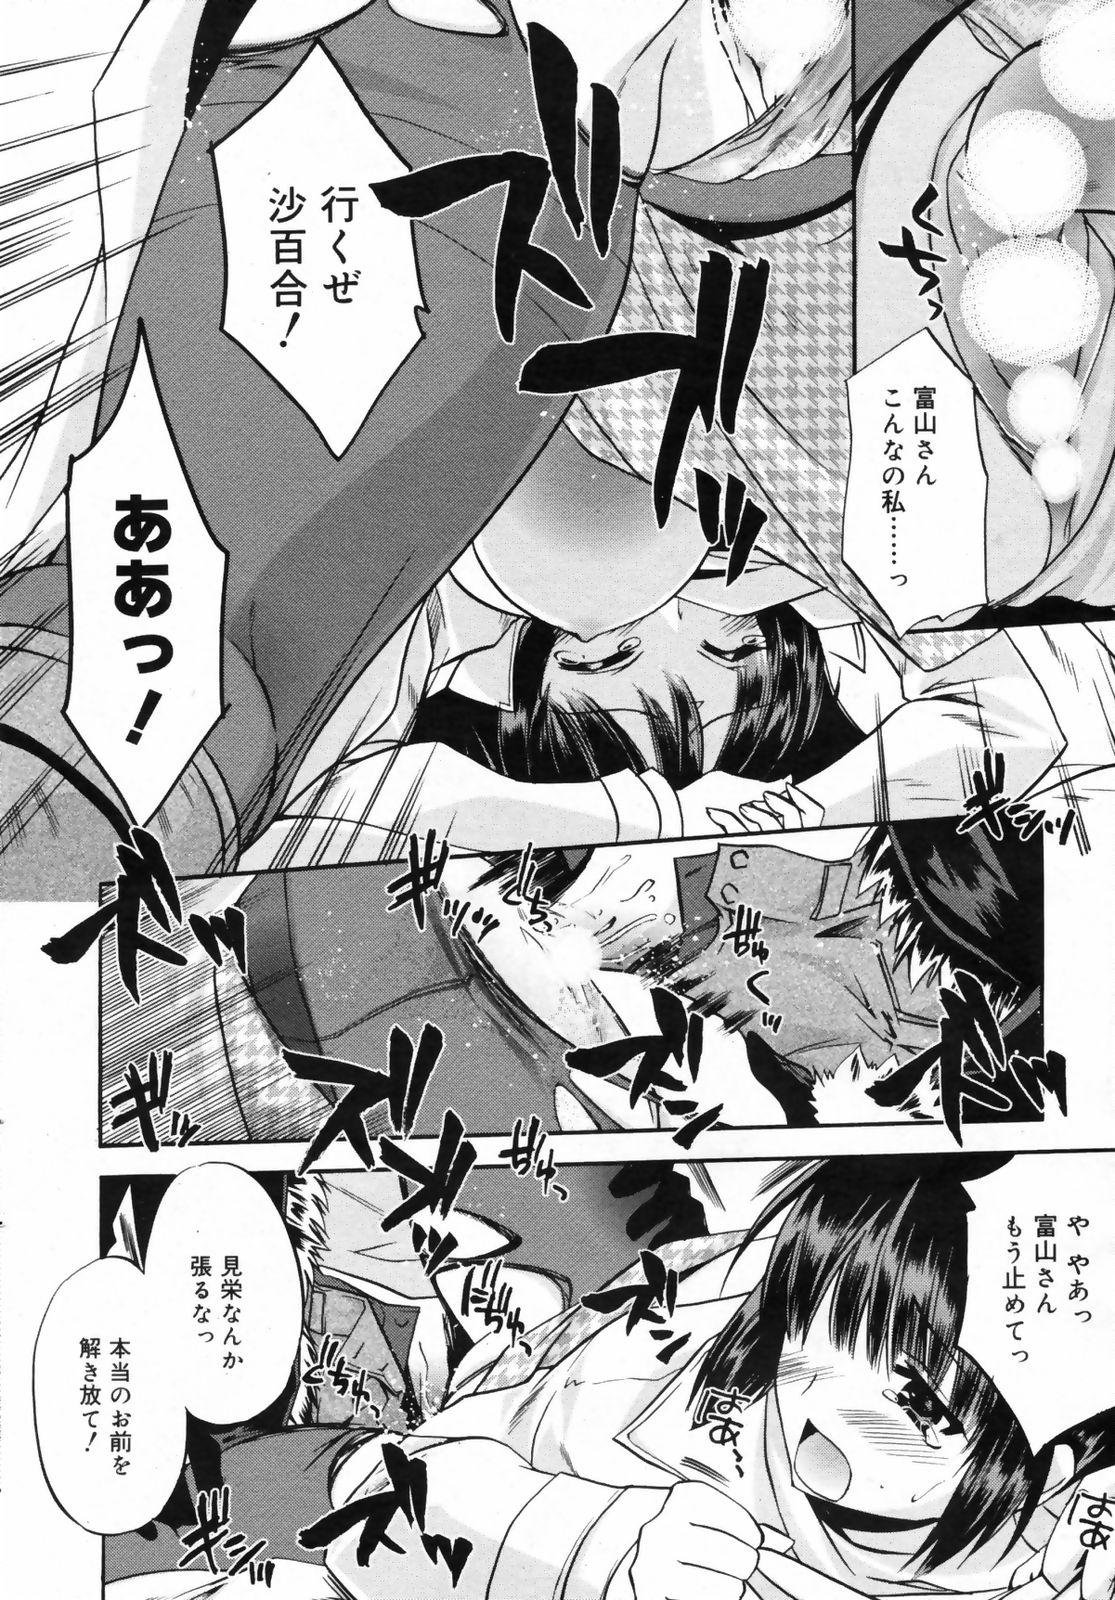 Manga Bangaichi 2009-02 Vol. 234 47